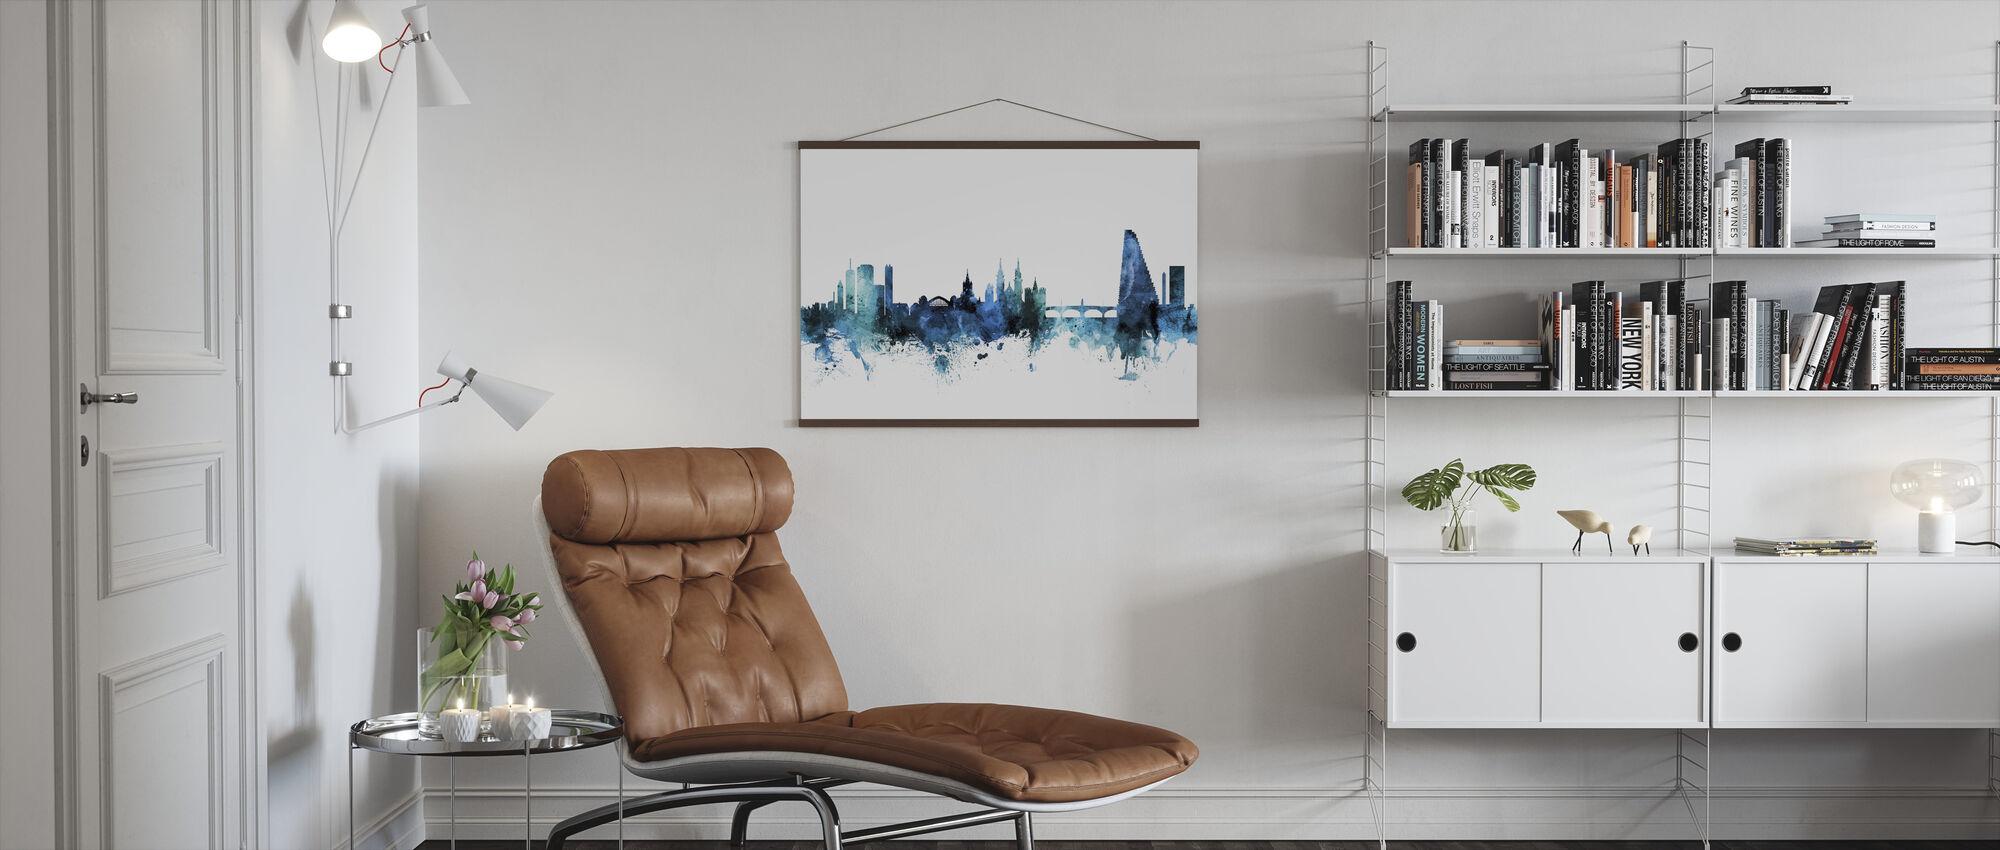 Skyline van Basel Zwitserland - Poster - Woonkamer